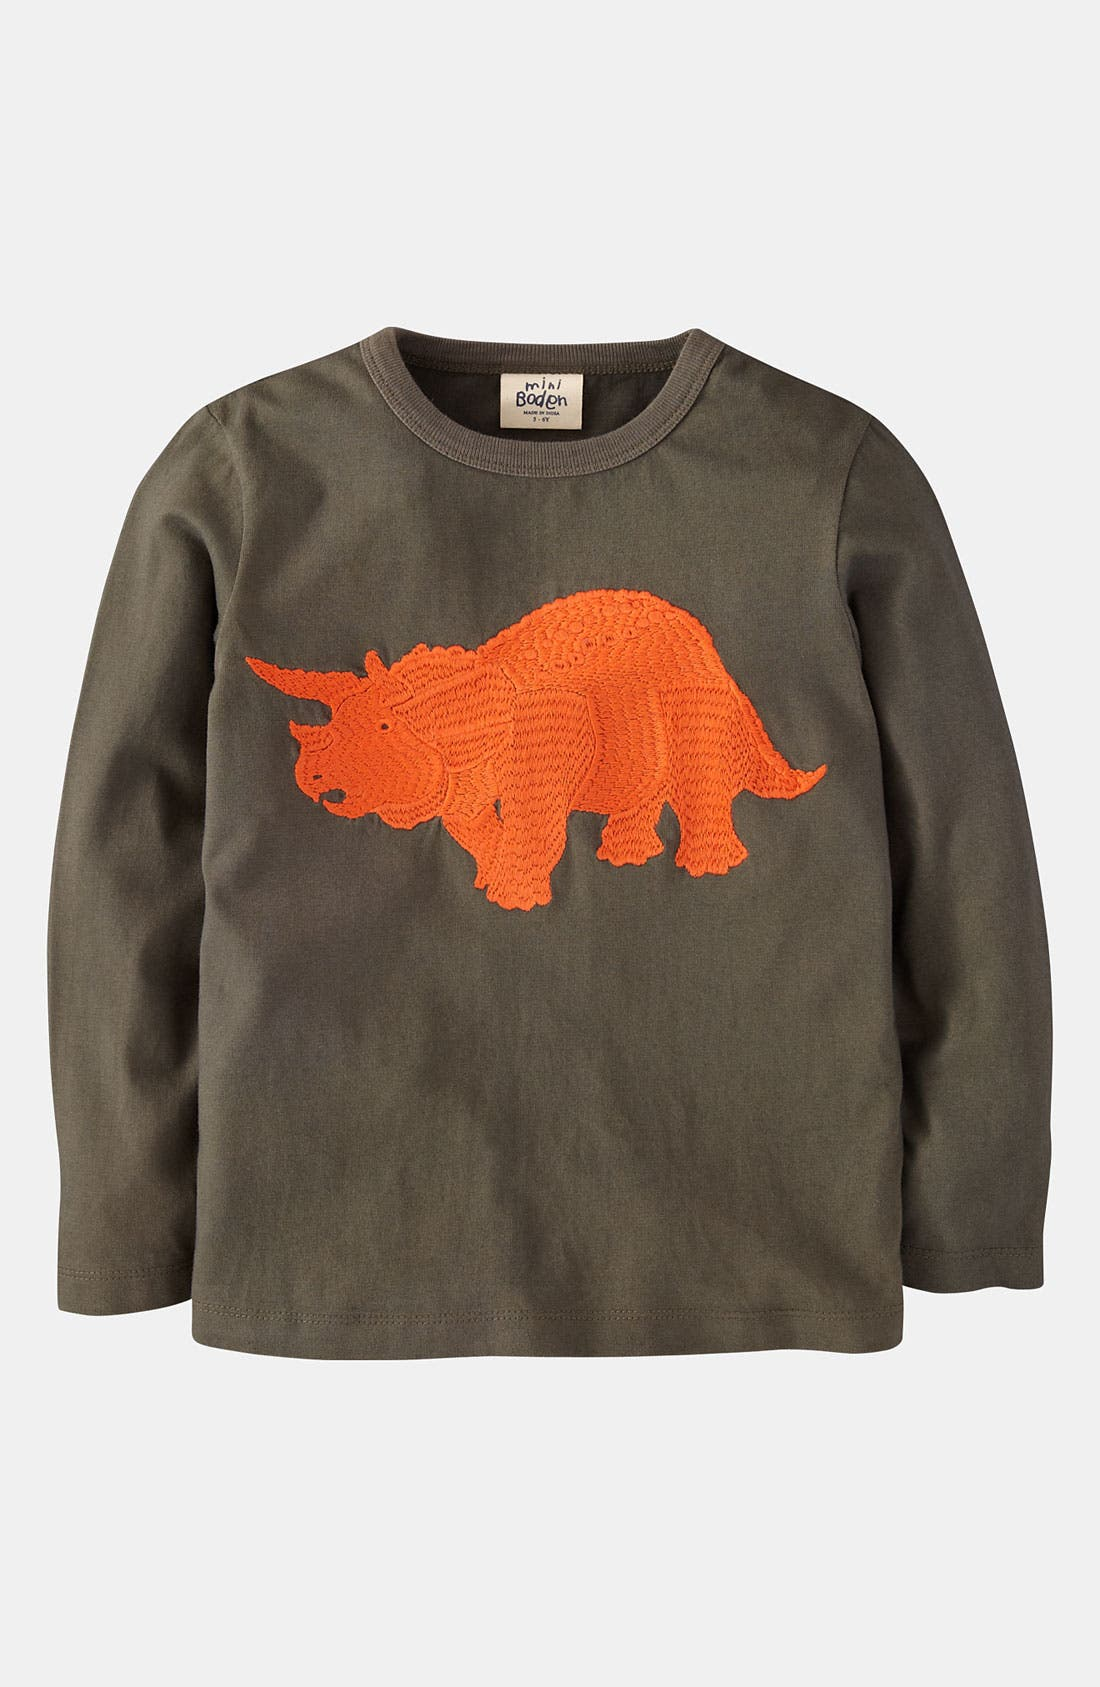 Alternate Image 1 Selected - Mini Boden 'Super Stitch' T-Shirt (Toddler)